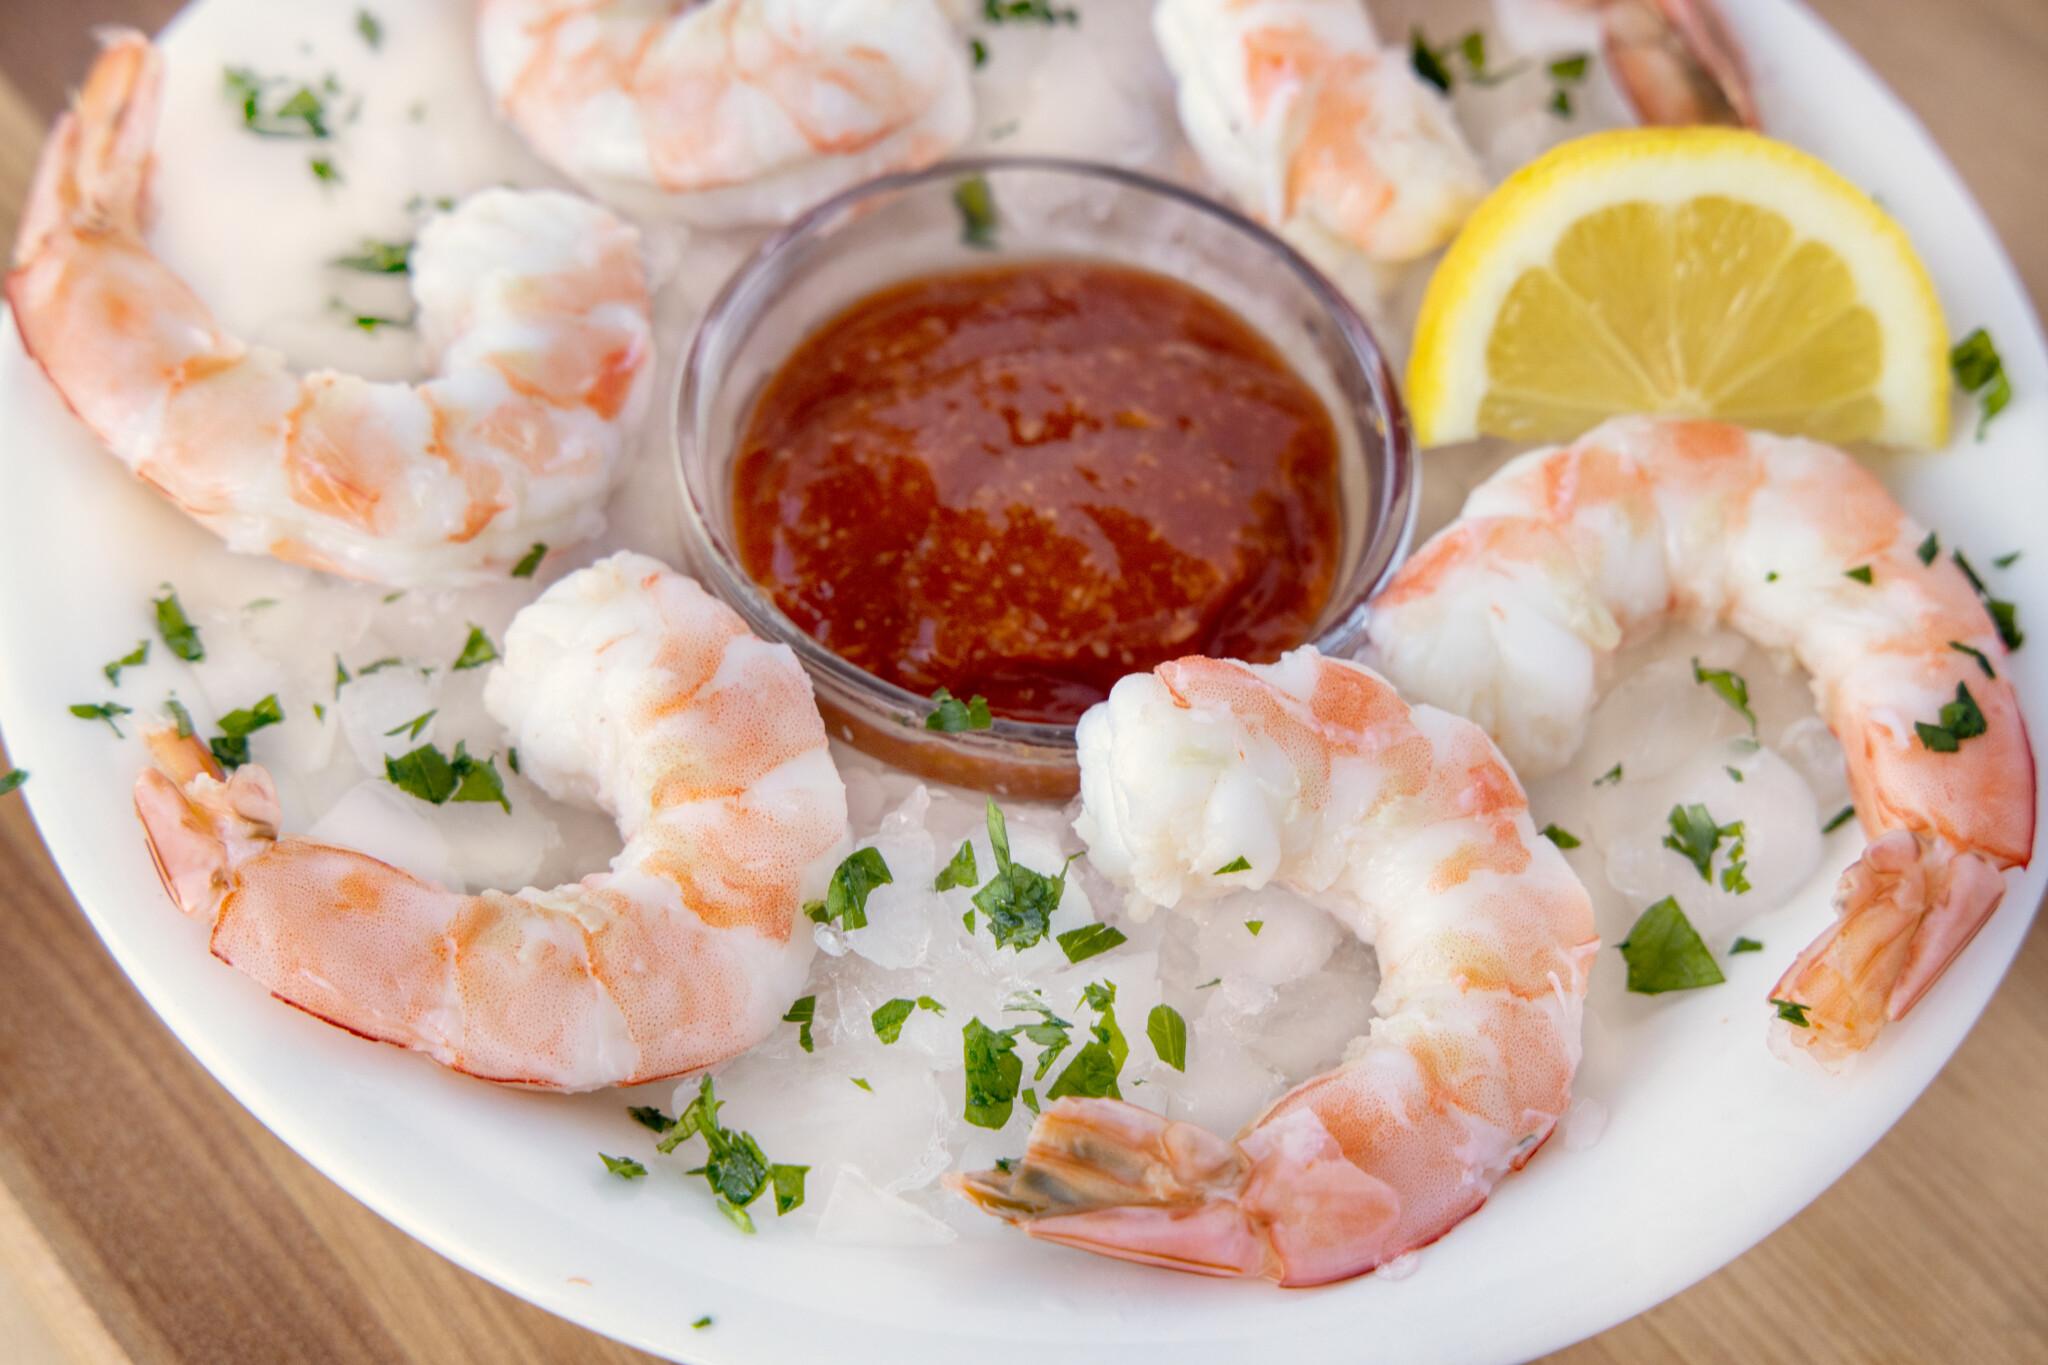 Restaurant Style Shrimp Cocktail